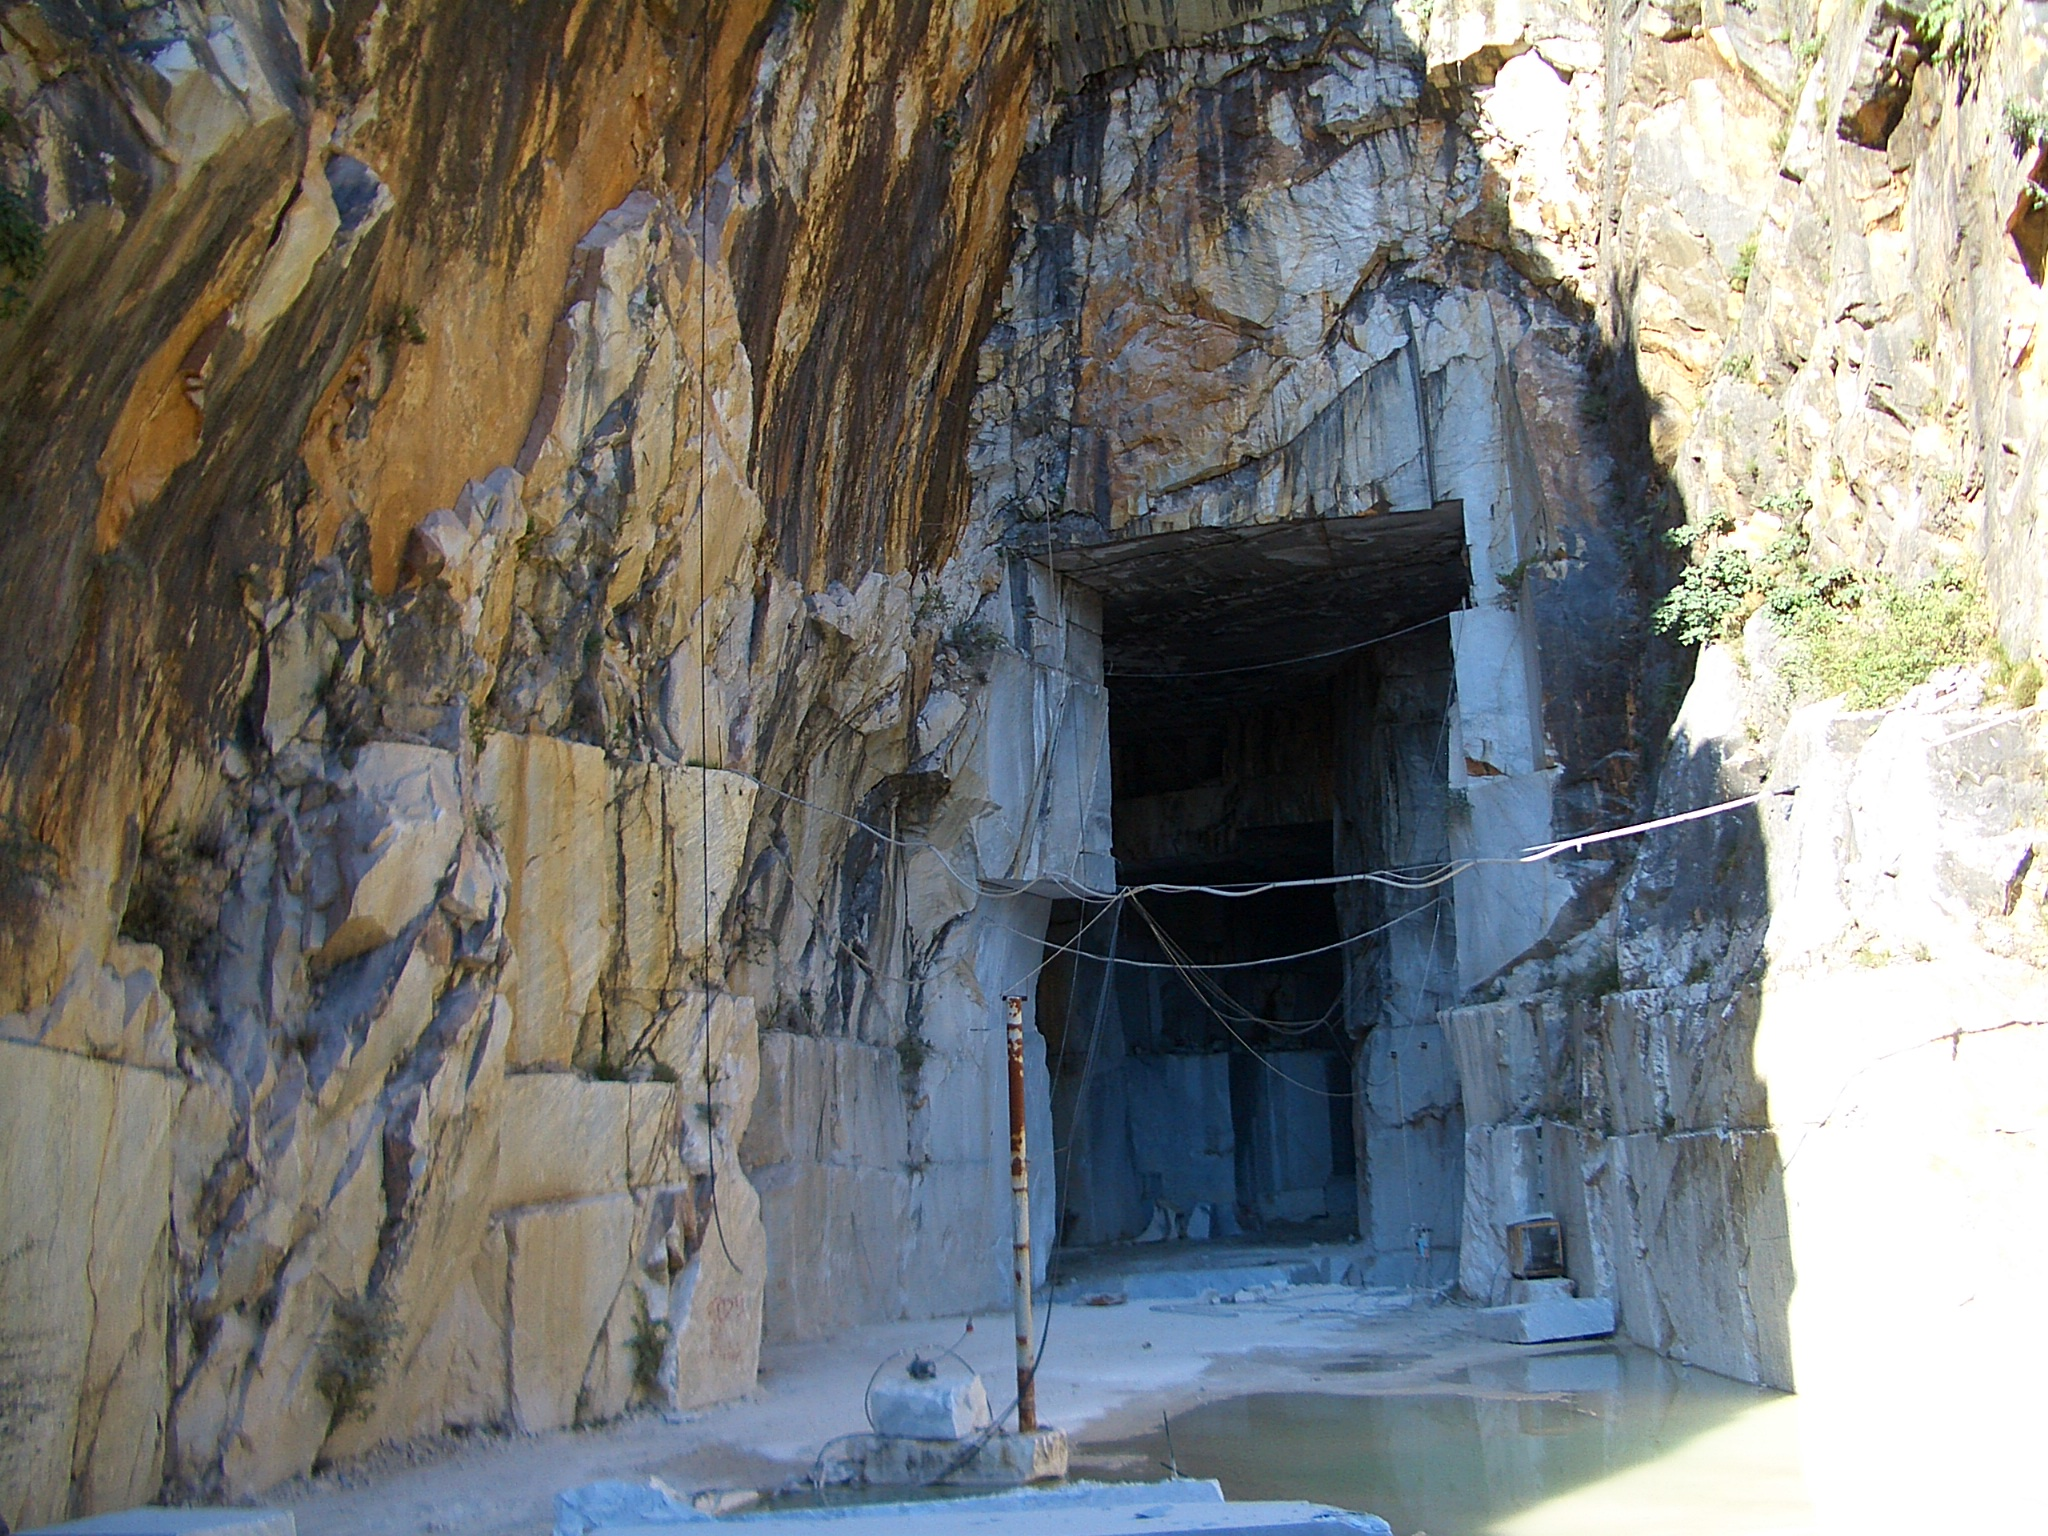 File:Inside a Carrara marble quarry 6399 jpg - Wikimedia Commons